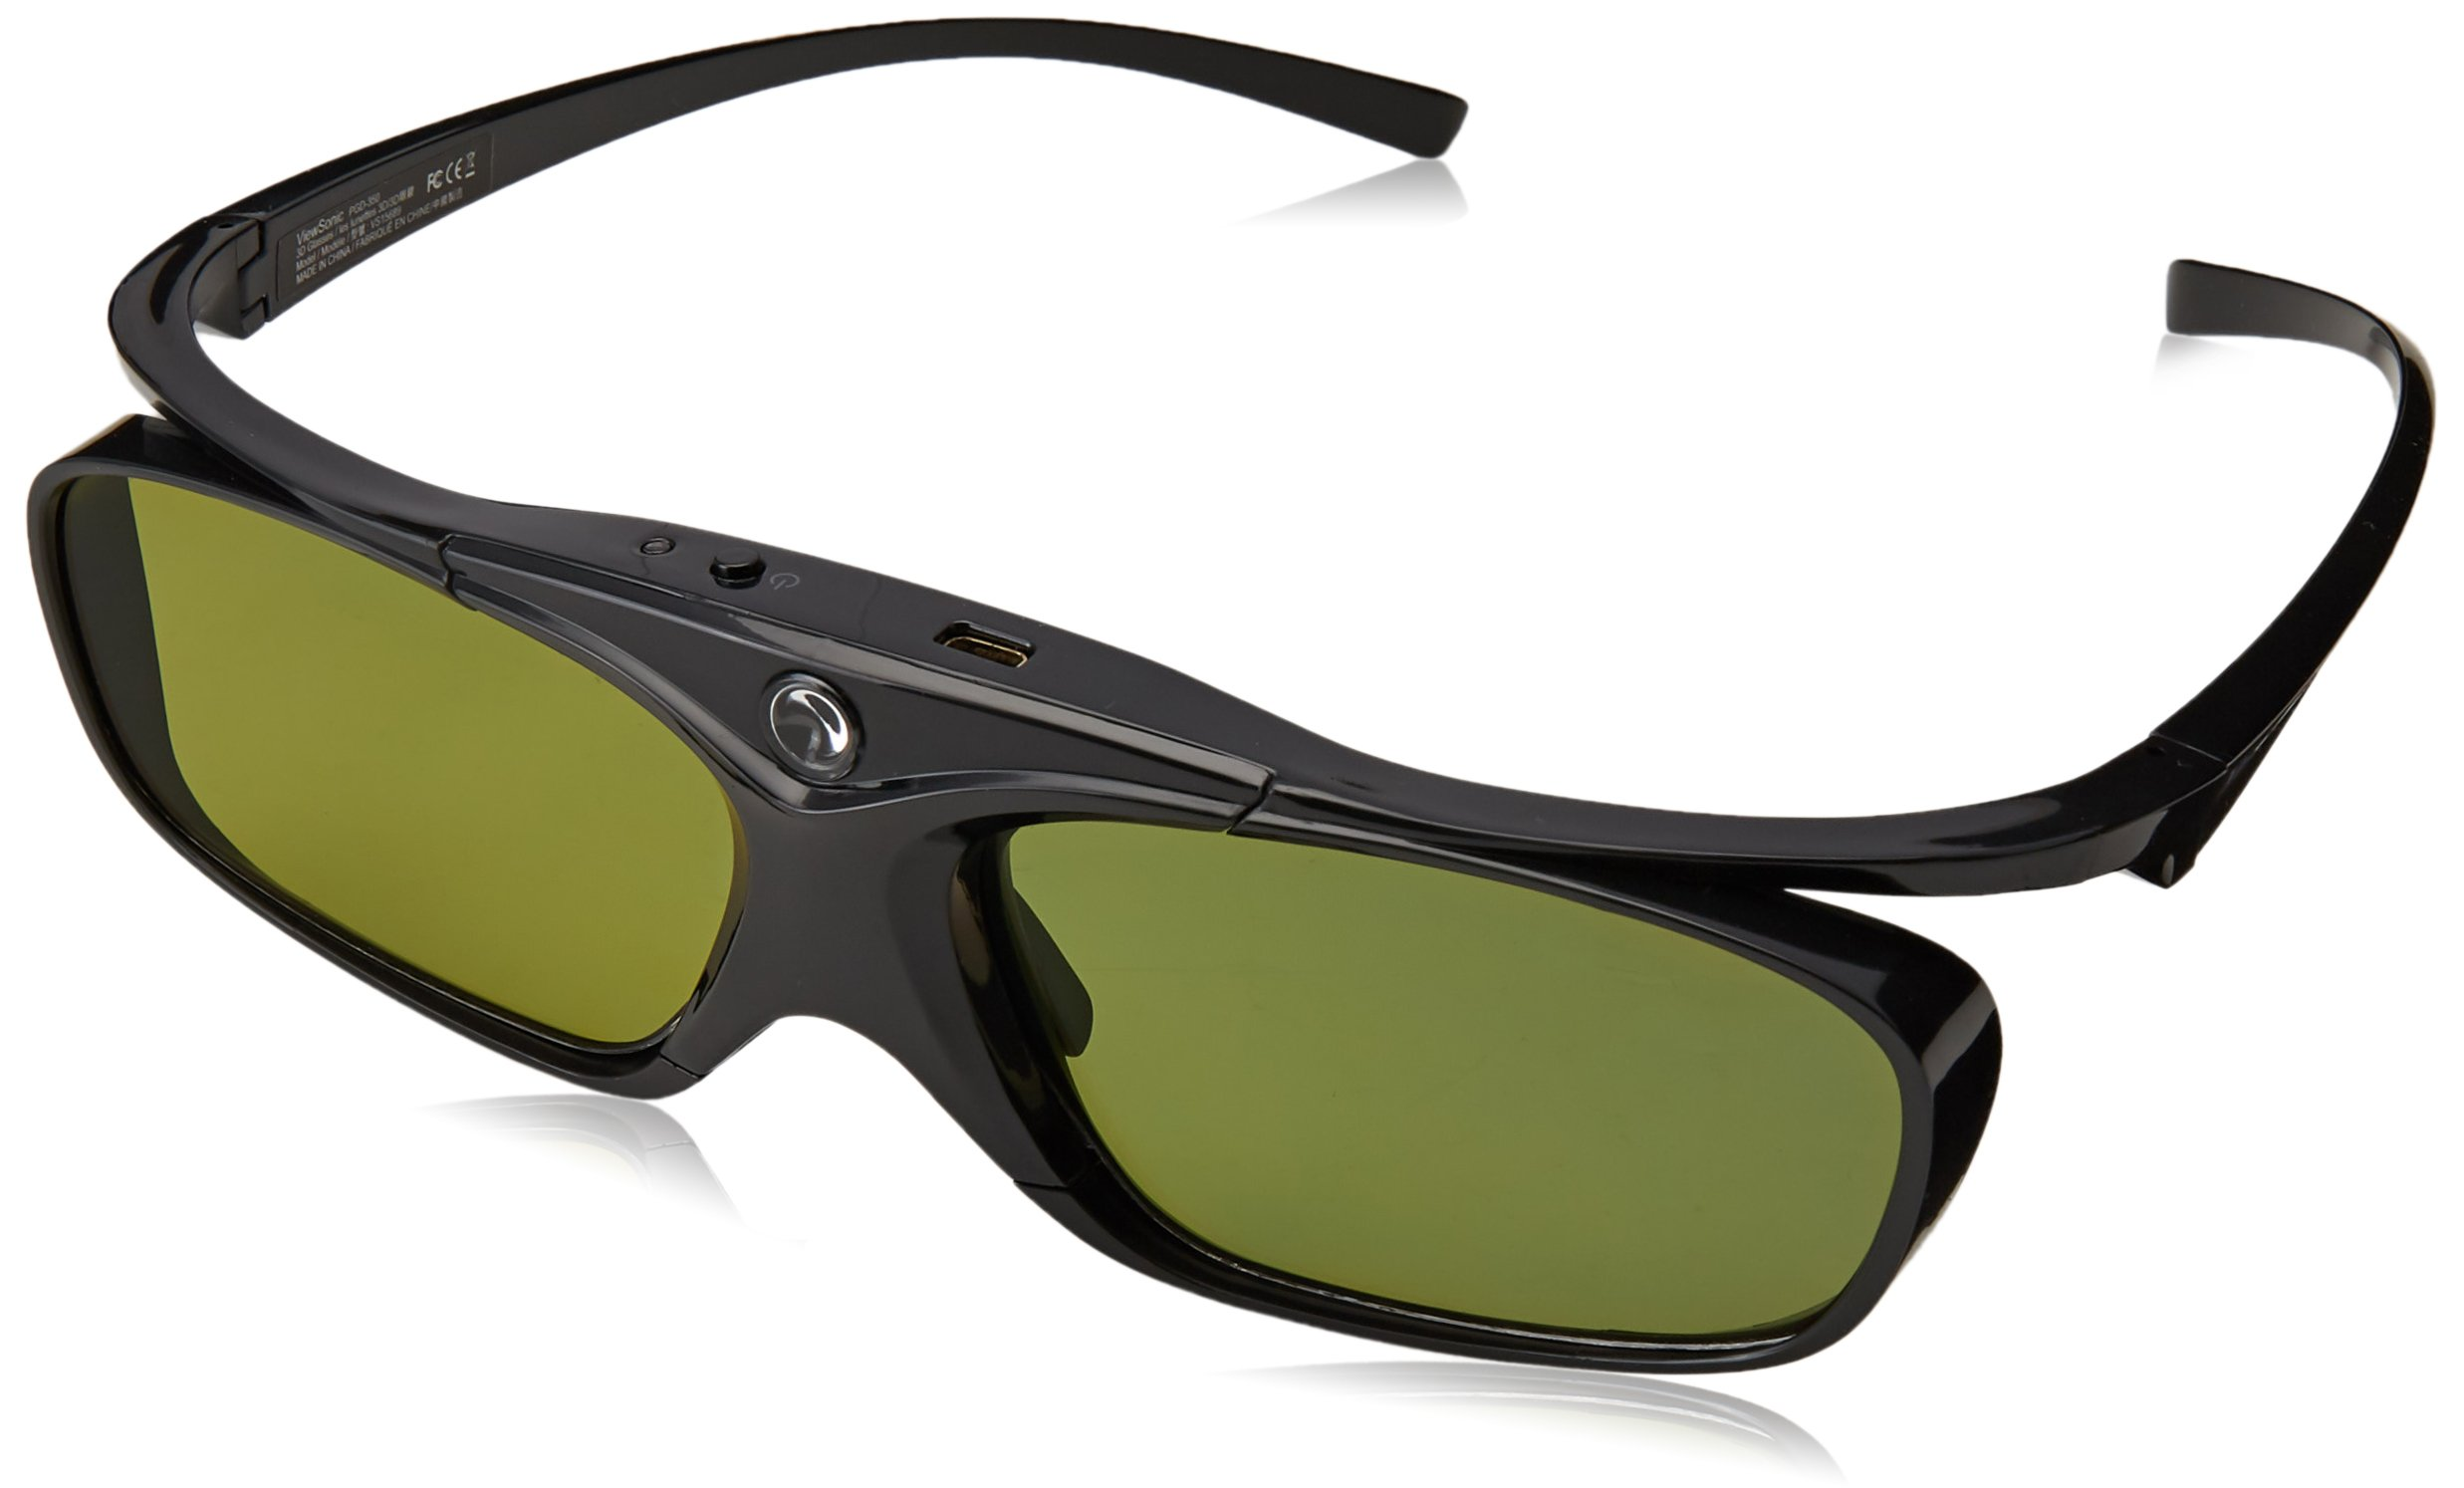 ViewSonic PGD-350 3D Glasses for DLP Projectors